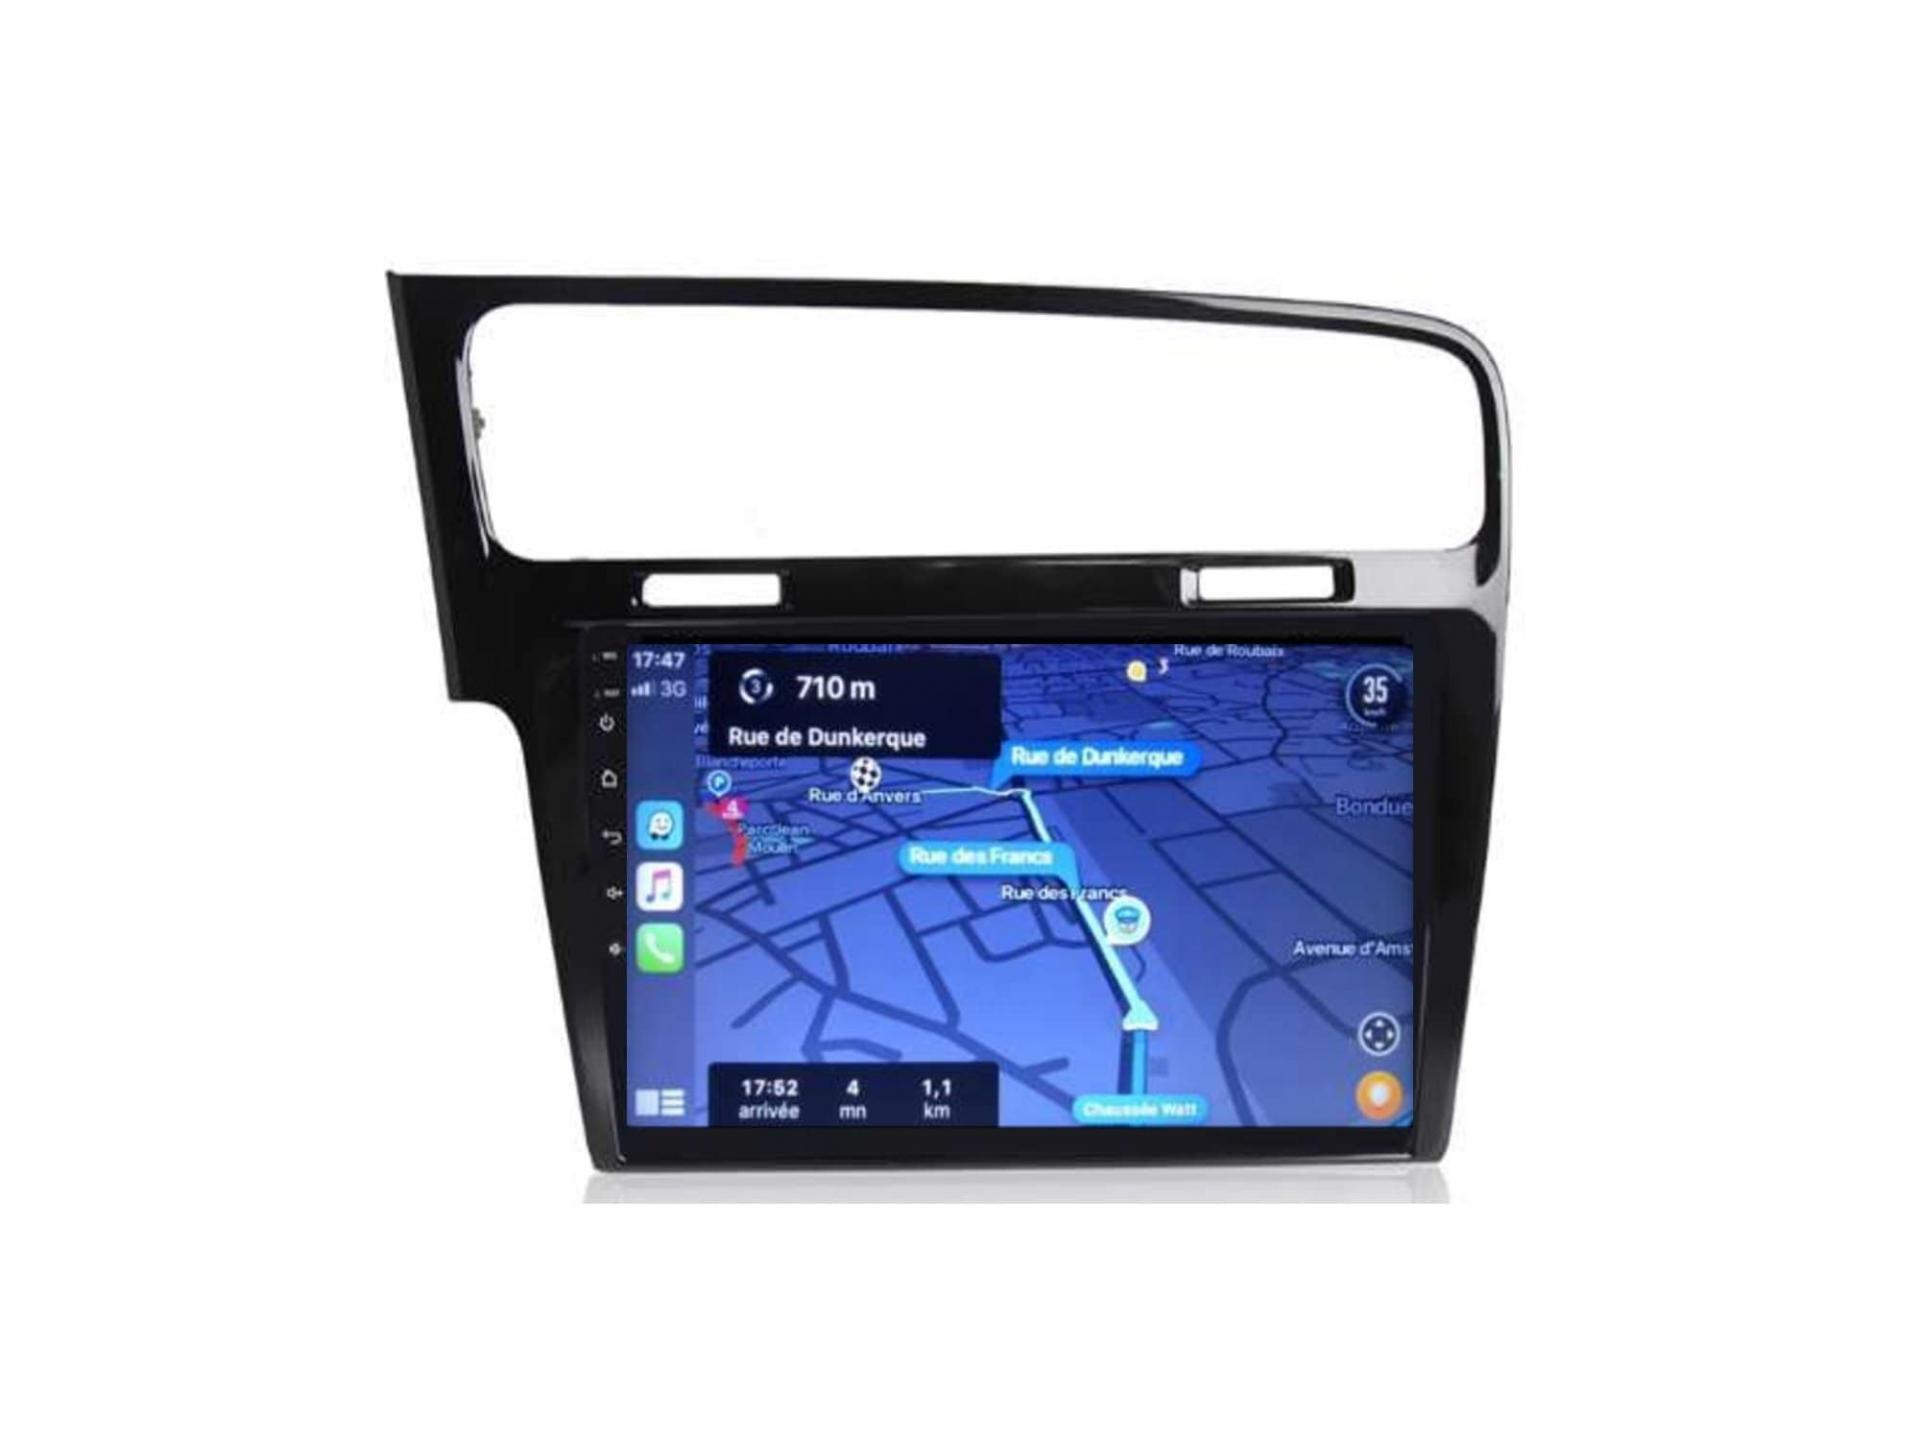 Autoradio gps carplay android auto bluetooth vw volkswagen golf 7 3